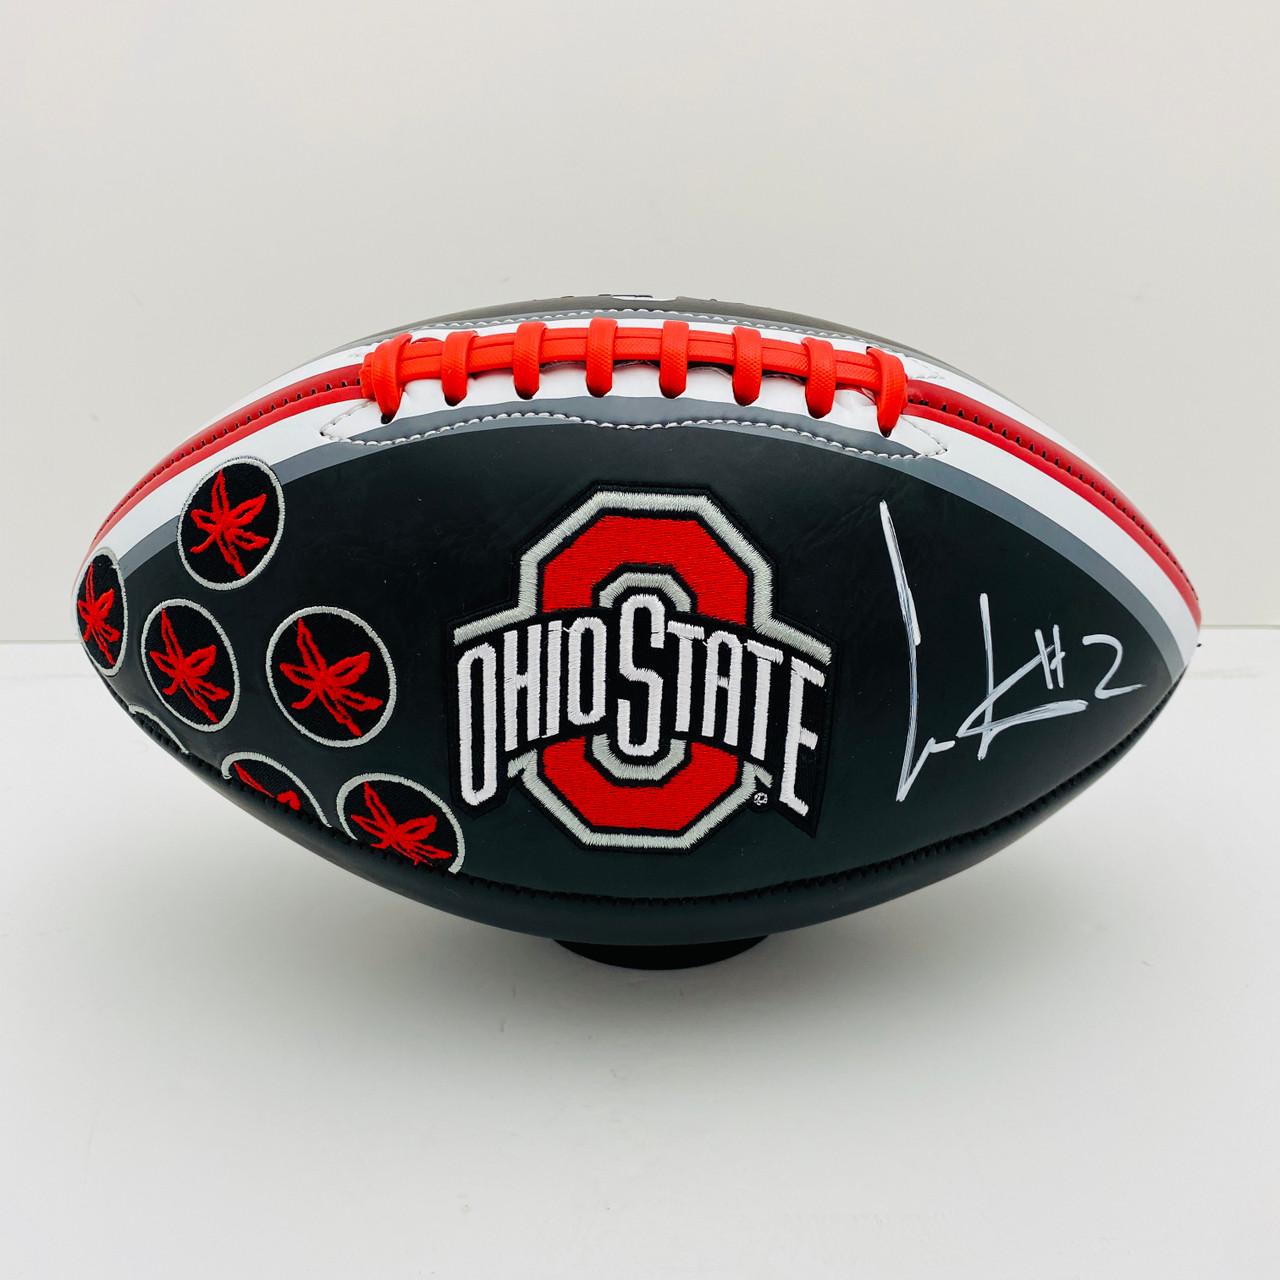 Cris Carter Ohio State Buckeyes Autographed Black Football - PSA Authentic